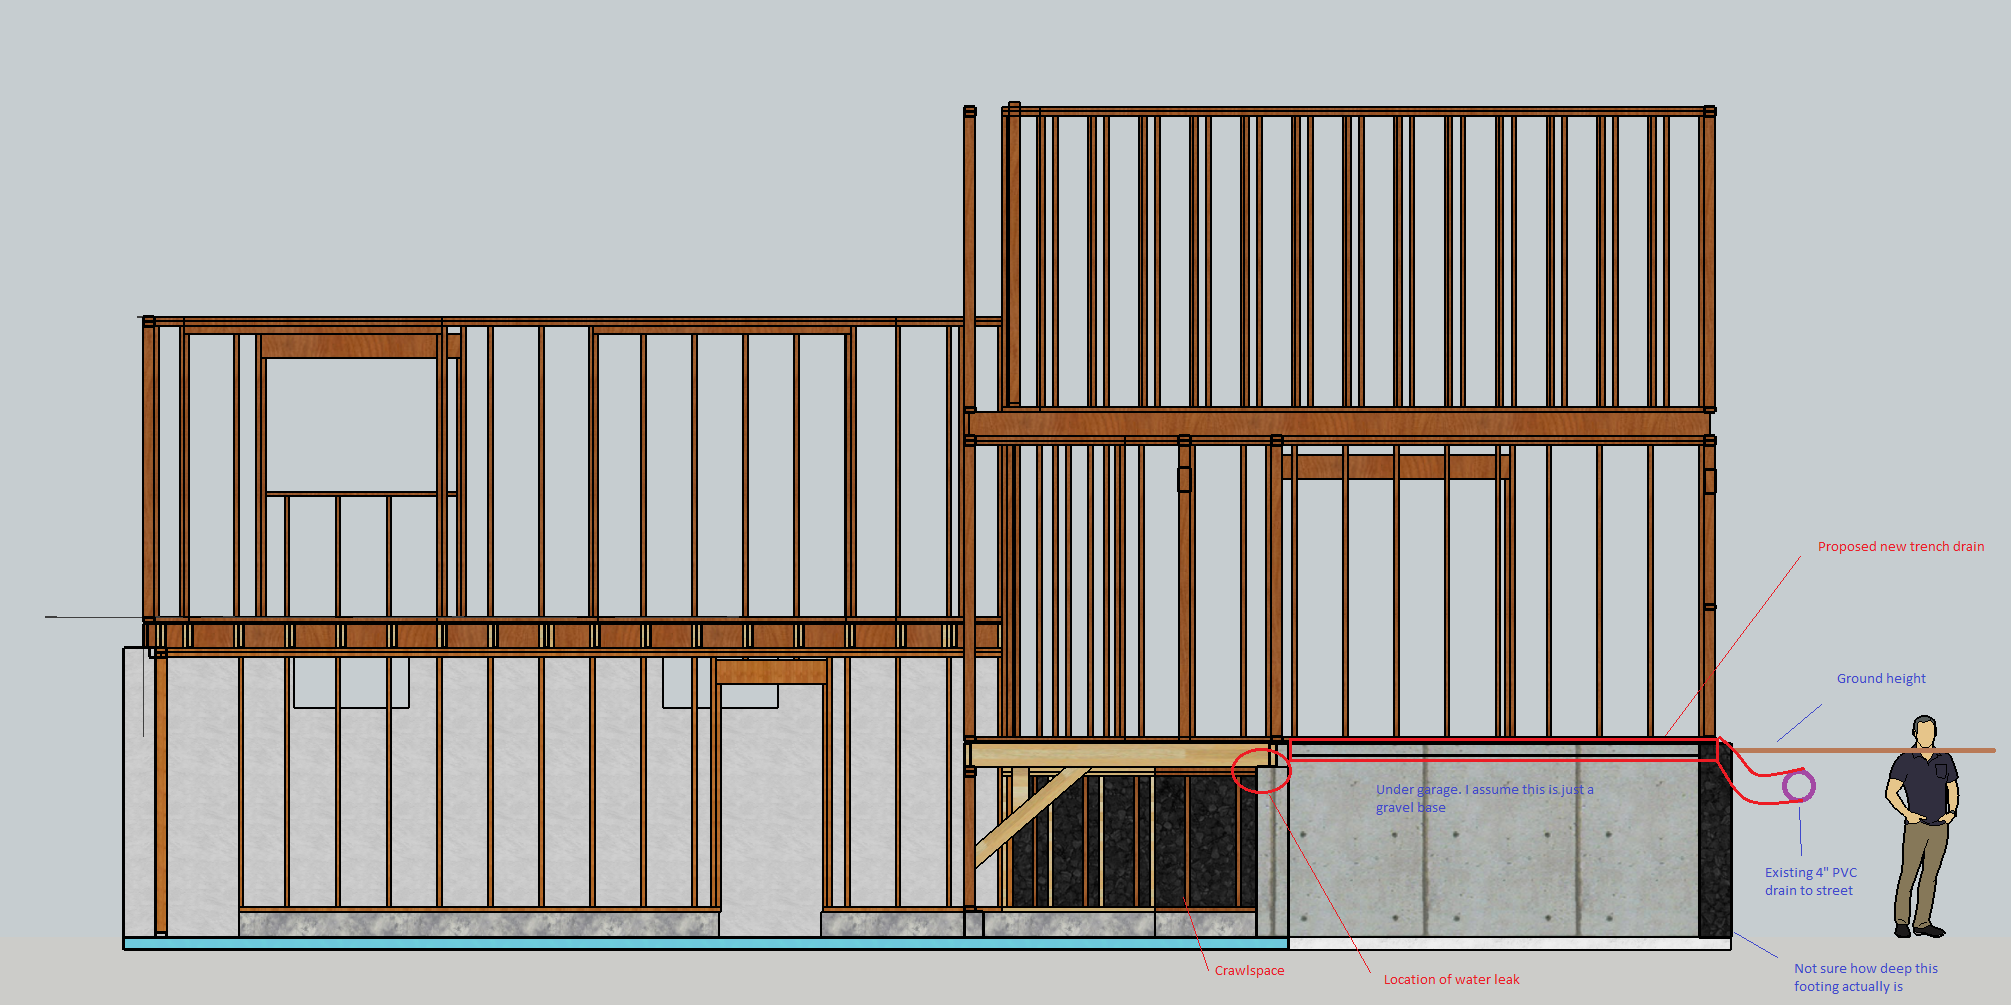 Repair Garage Threshold & Posts-frontview.png